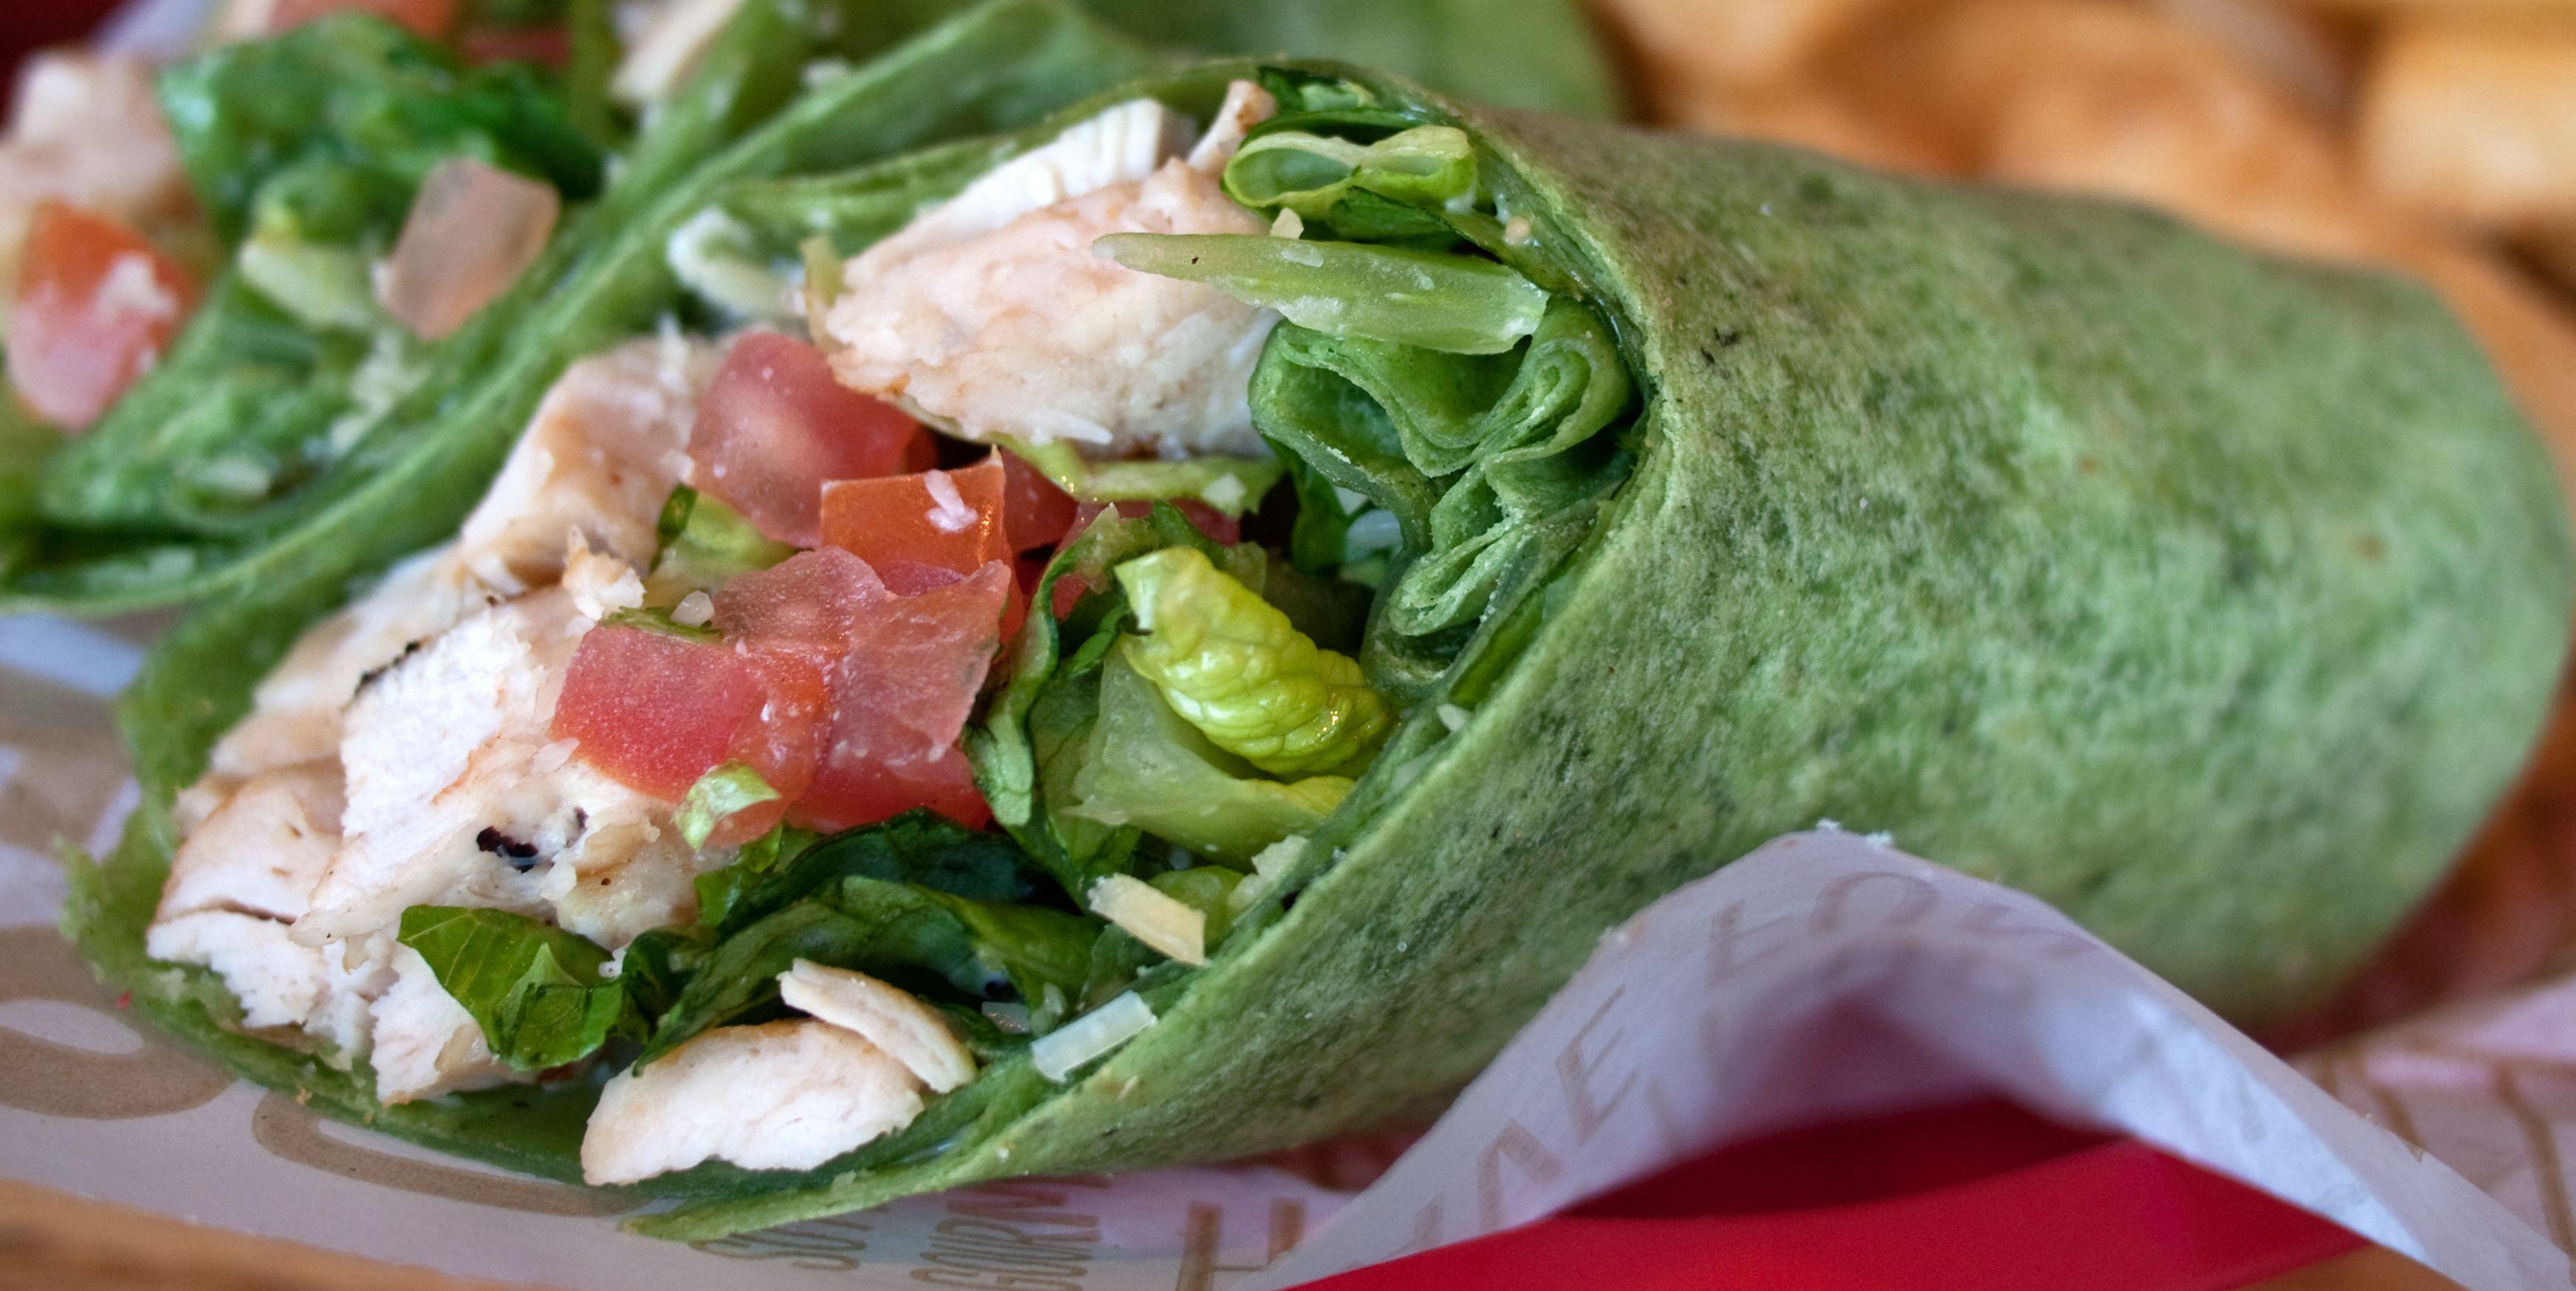 health-food-safety-salads-wraps